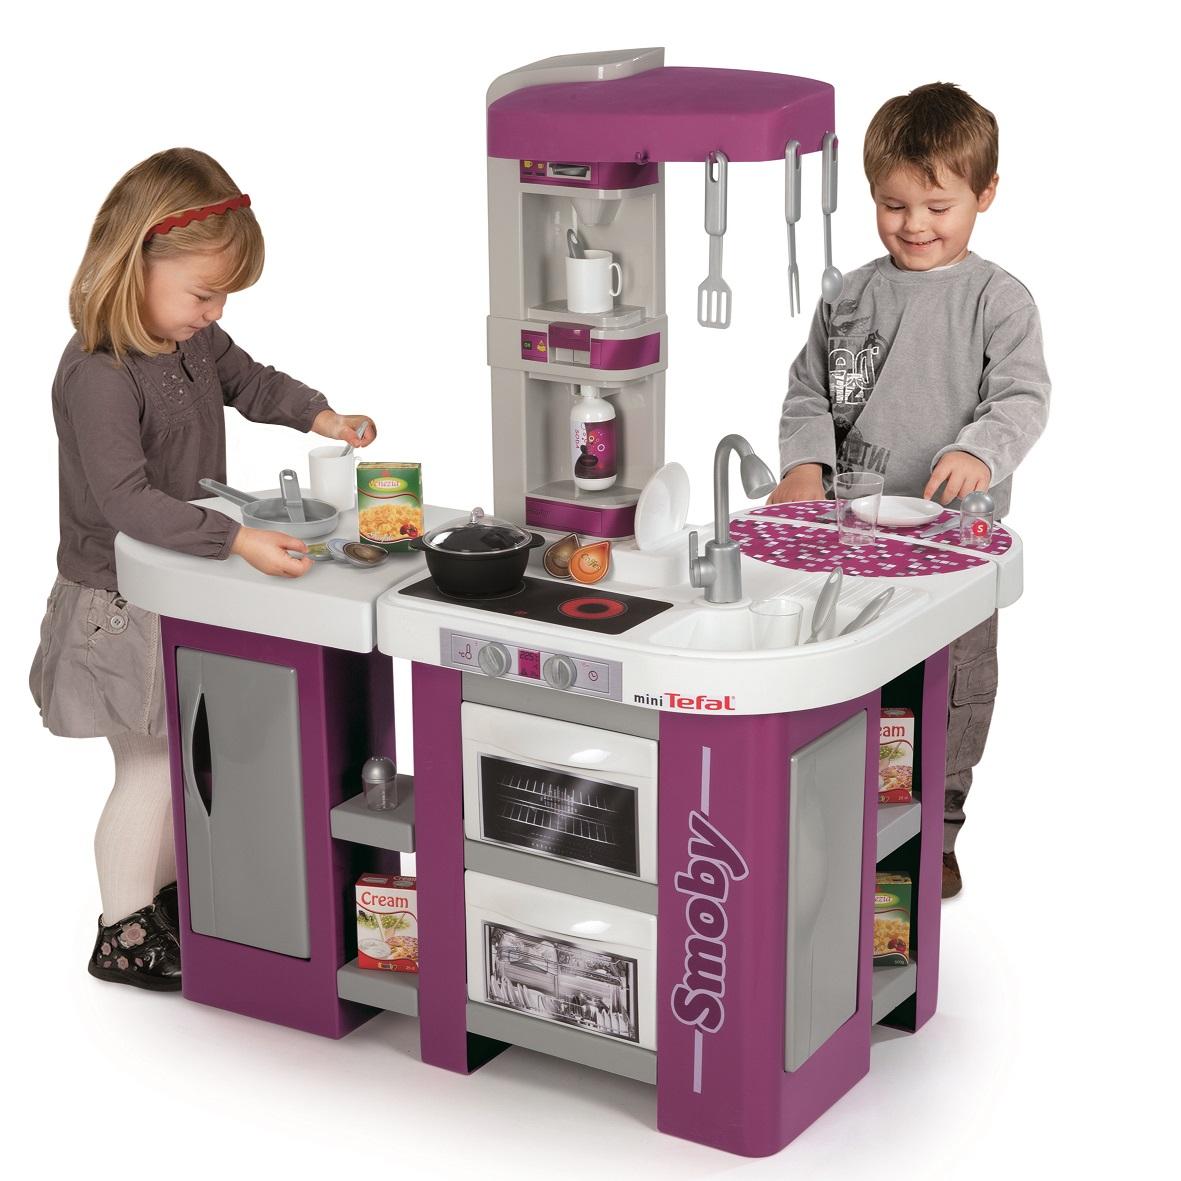 Tefal Studio XL Детская электронная кухня от Smoby, 24129   -> Kuchnie Dla Dzieci Mini Tefal